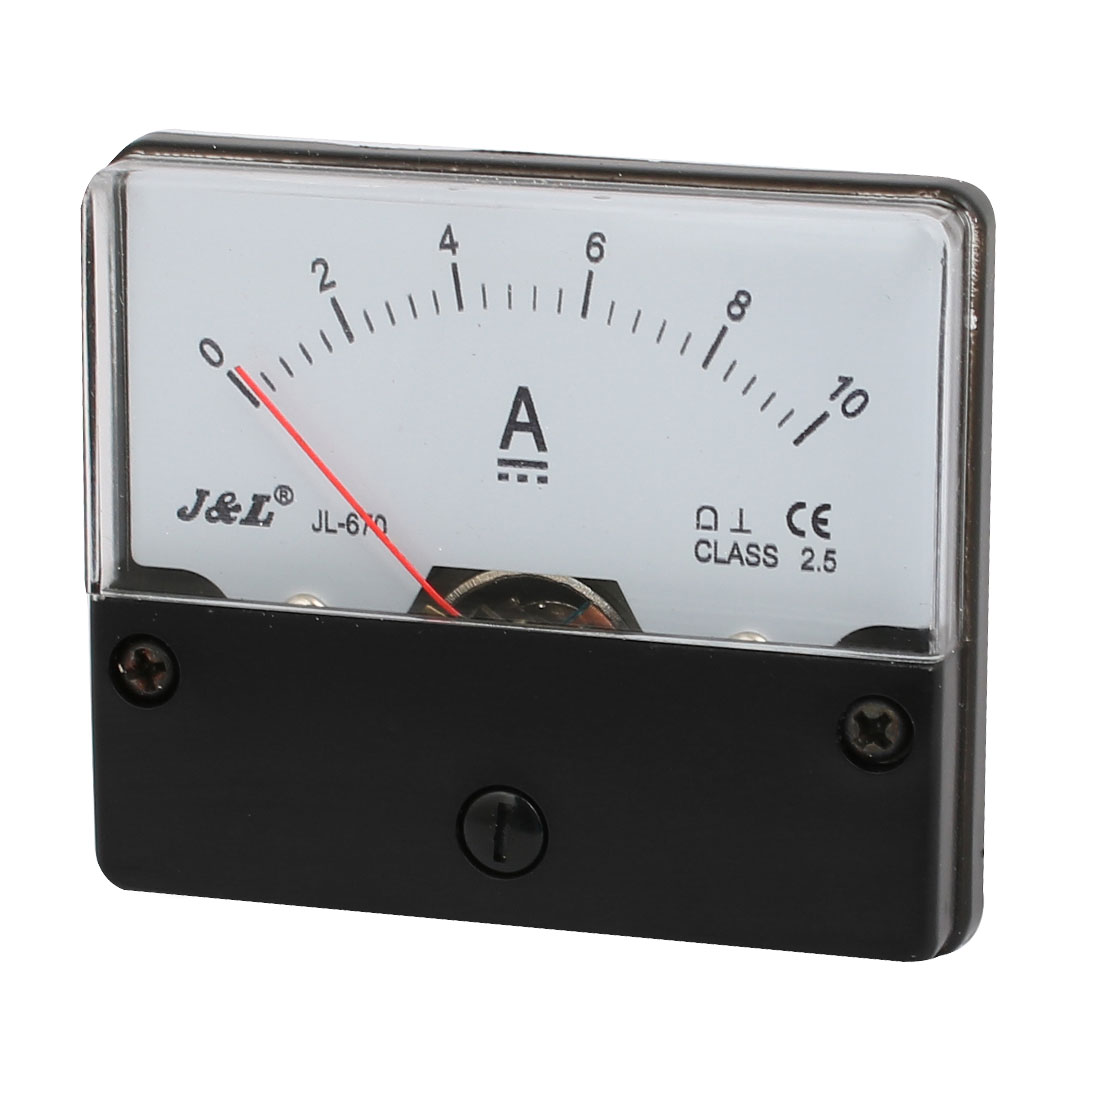 DC10A Class 2.5 Analog Current Rectangle Panel Meter Ammeter Gauge